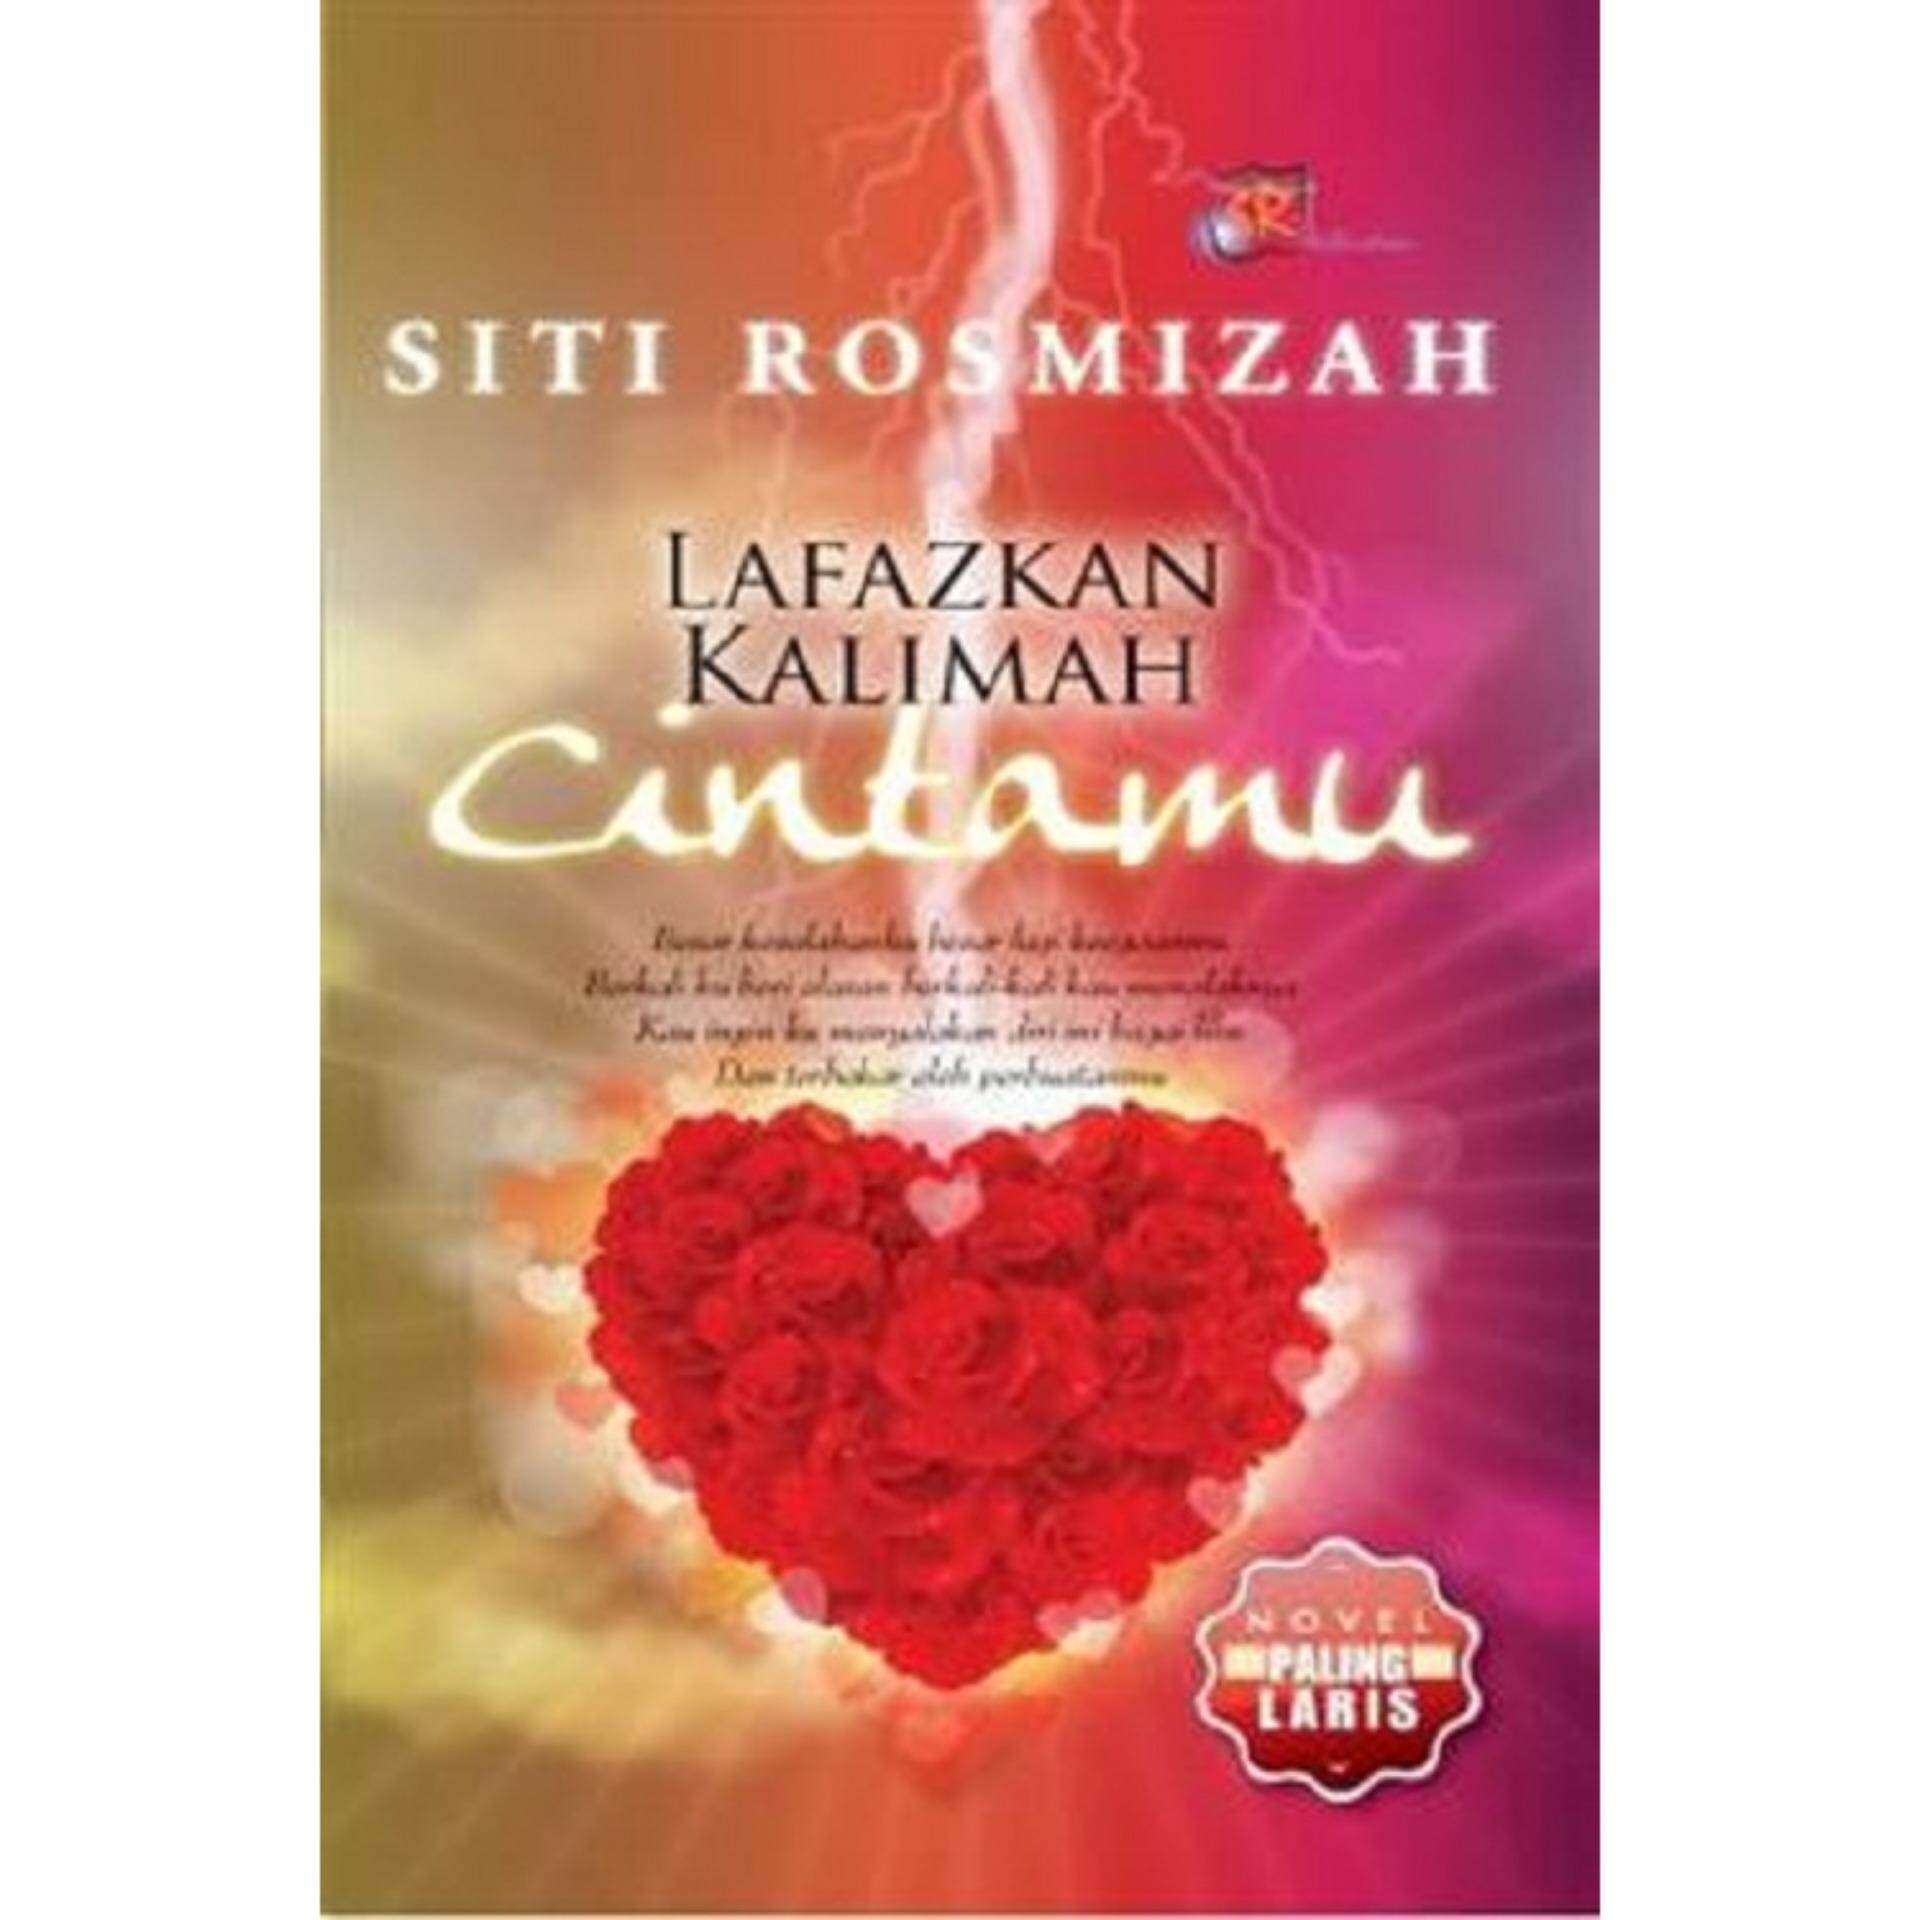 Lafazkan Kalimah Cintamu Isbn : 9789675822001 Author By : Siti Rosmizah By Mph Bookstores.